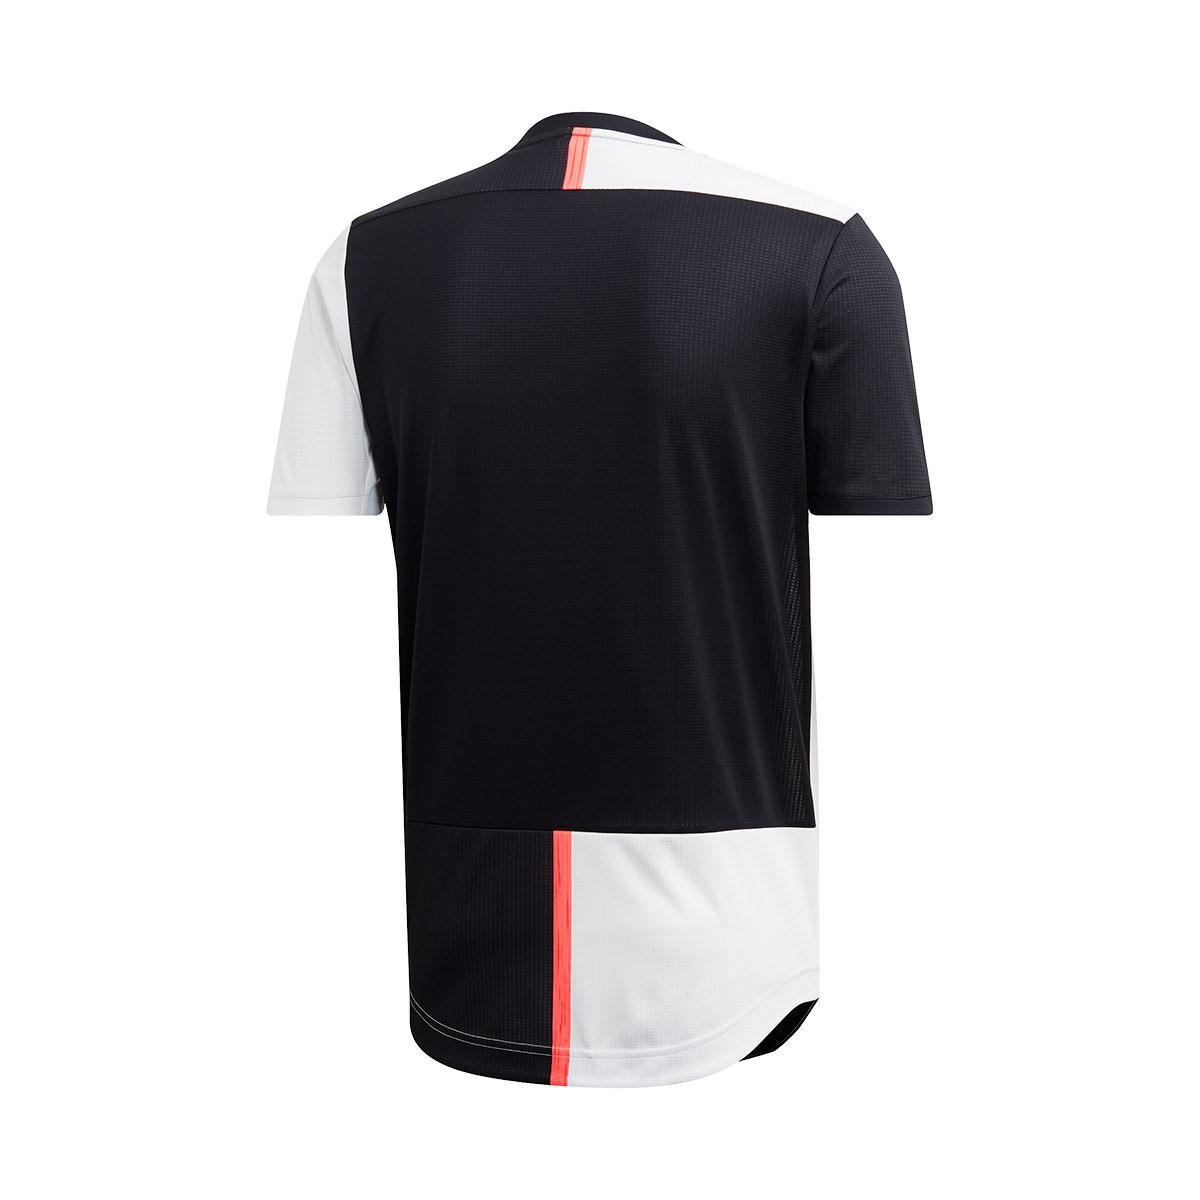 promo code 553a3 93dbb Camiseta Juventus Authentic Primera Equipación 2019-2020 Black-White